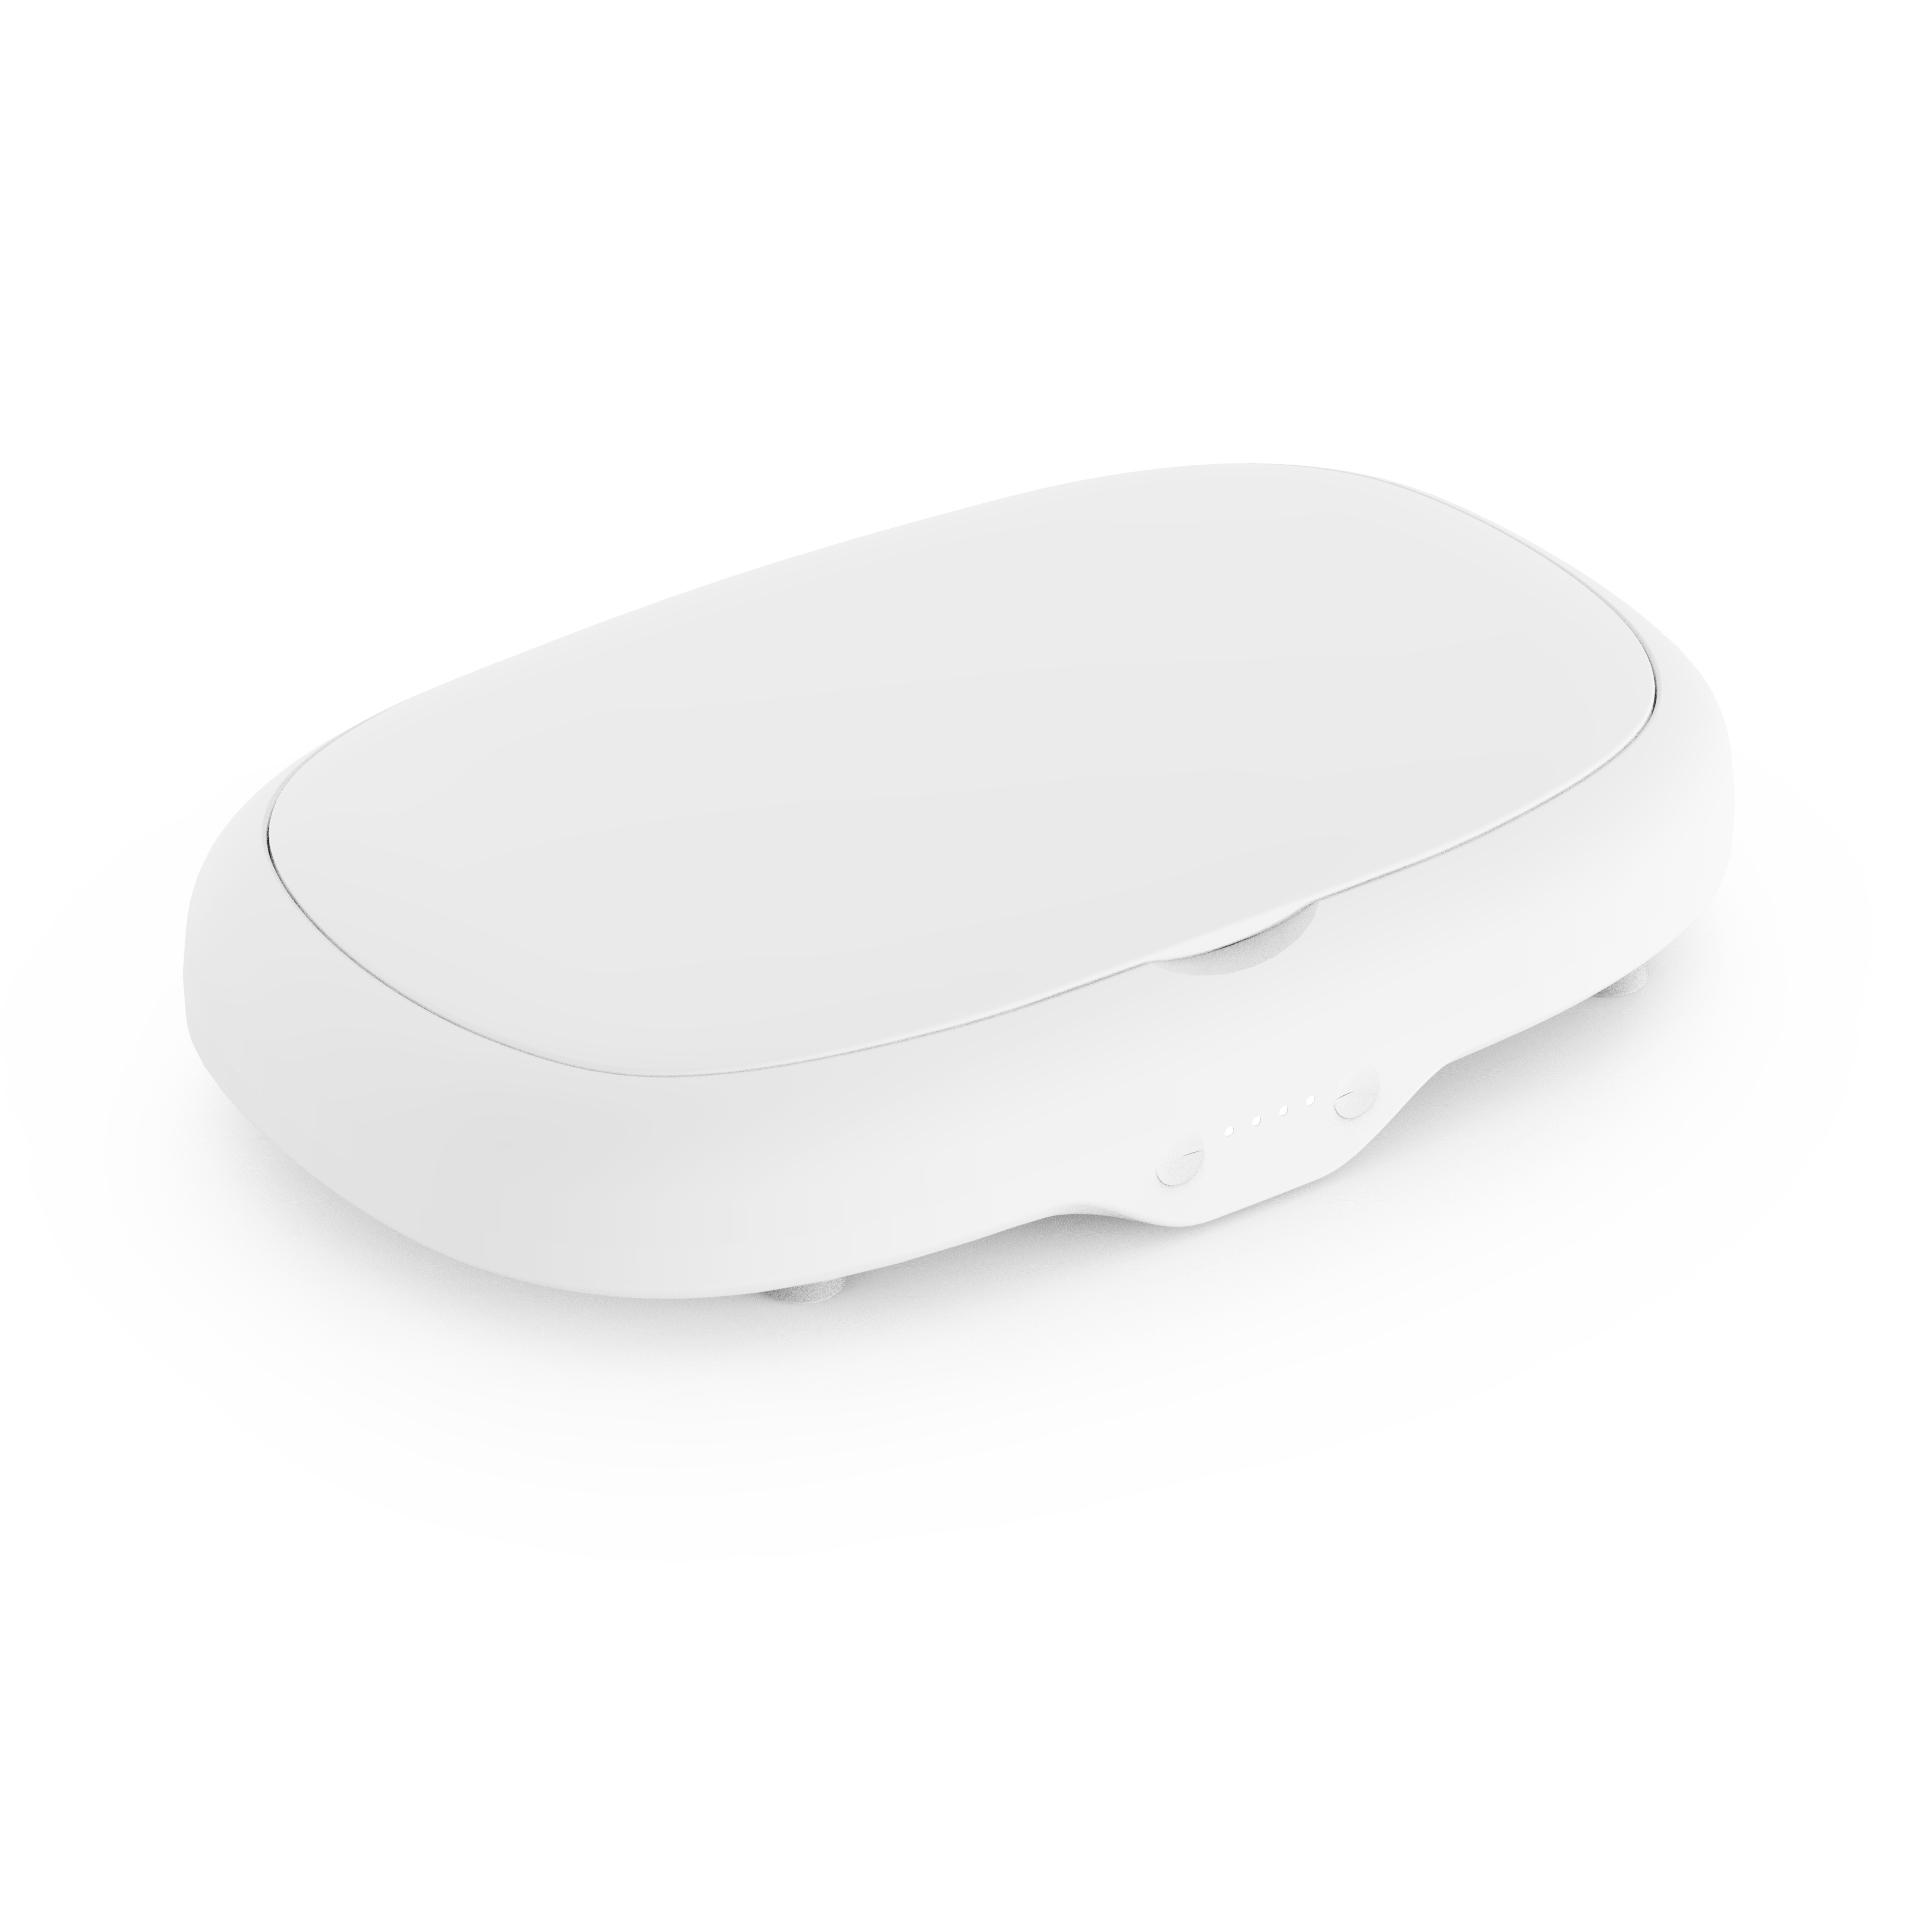 uv sterilizer 자외선 살균기 소독기 멸균기 자외선 마스크 소독 케이스 소형 휴대전화 안경 다기능 무선충전 휴대용 uv 오존 살균기, 1.흰색